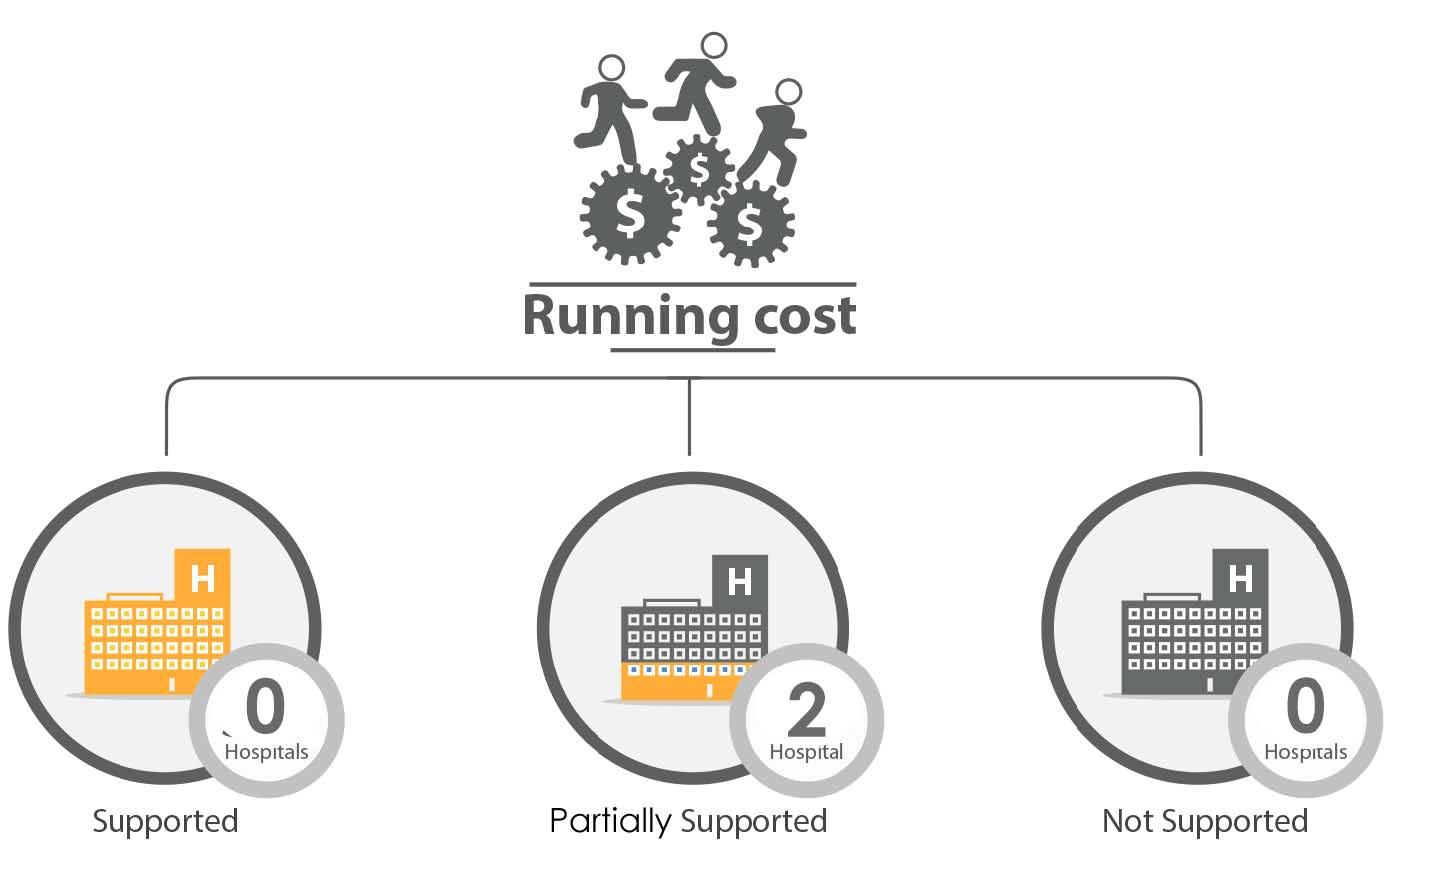 Fig._159.6_Financial_Support_Running_Cost__Latakia.jpg